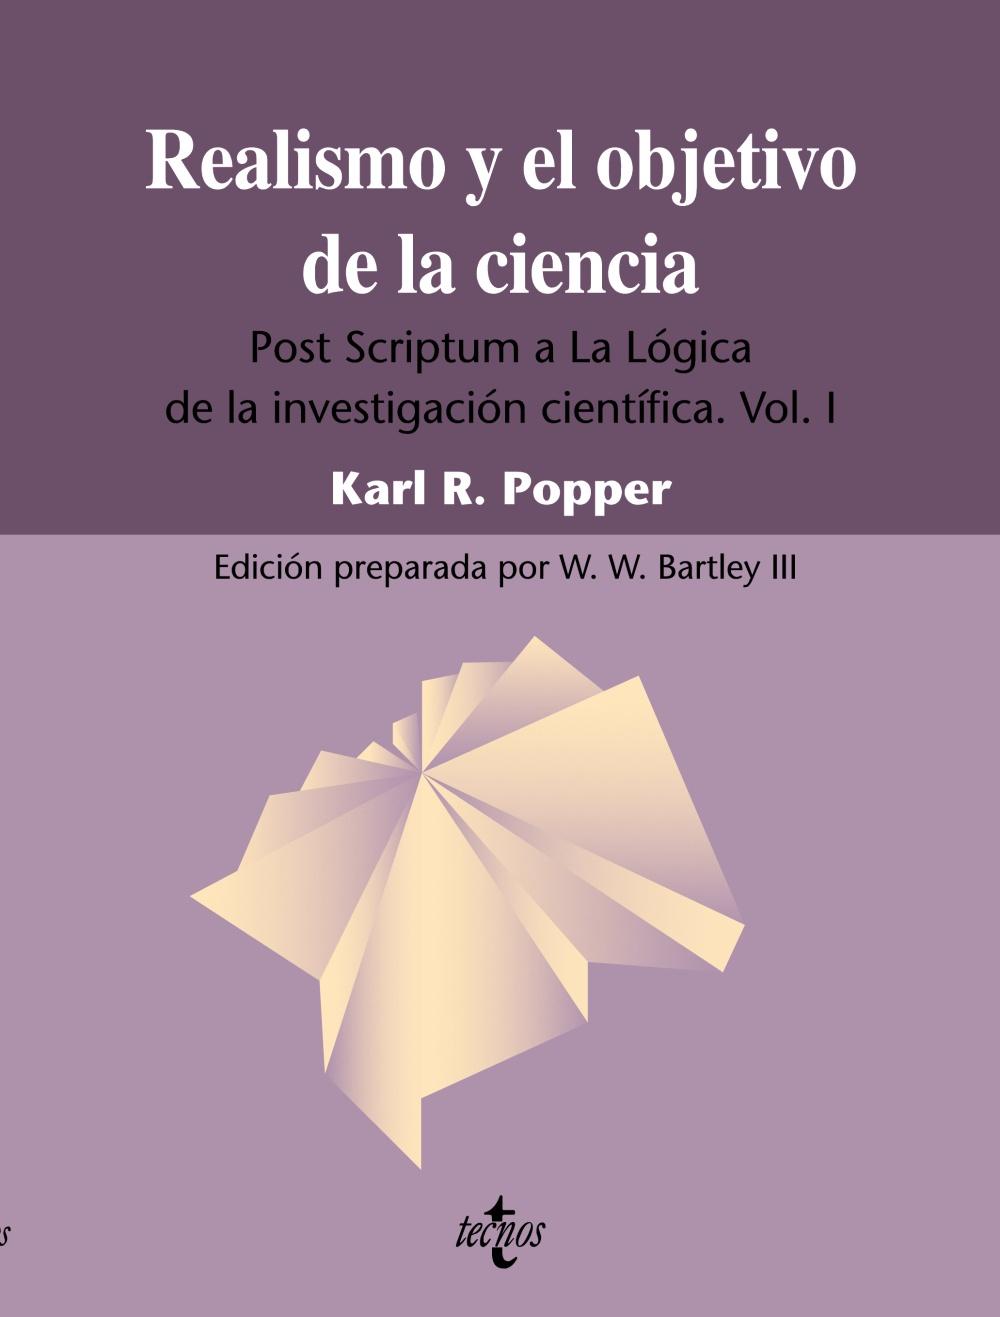 realismo y objetivo de la ciencia: post scriptum a la logica de l a investigacion cientifica vol. 1  (3ª ed.)-karl r. popper-9788430950737